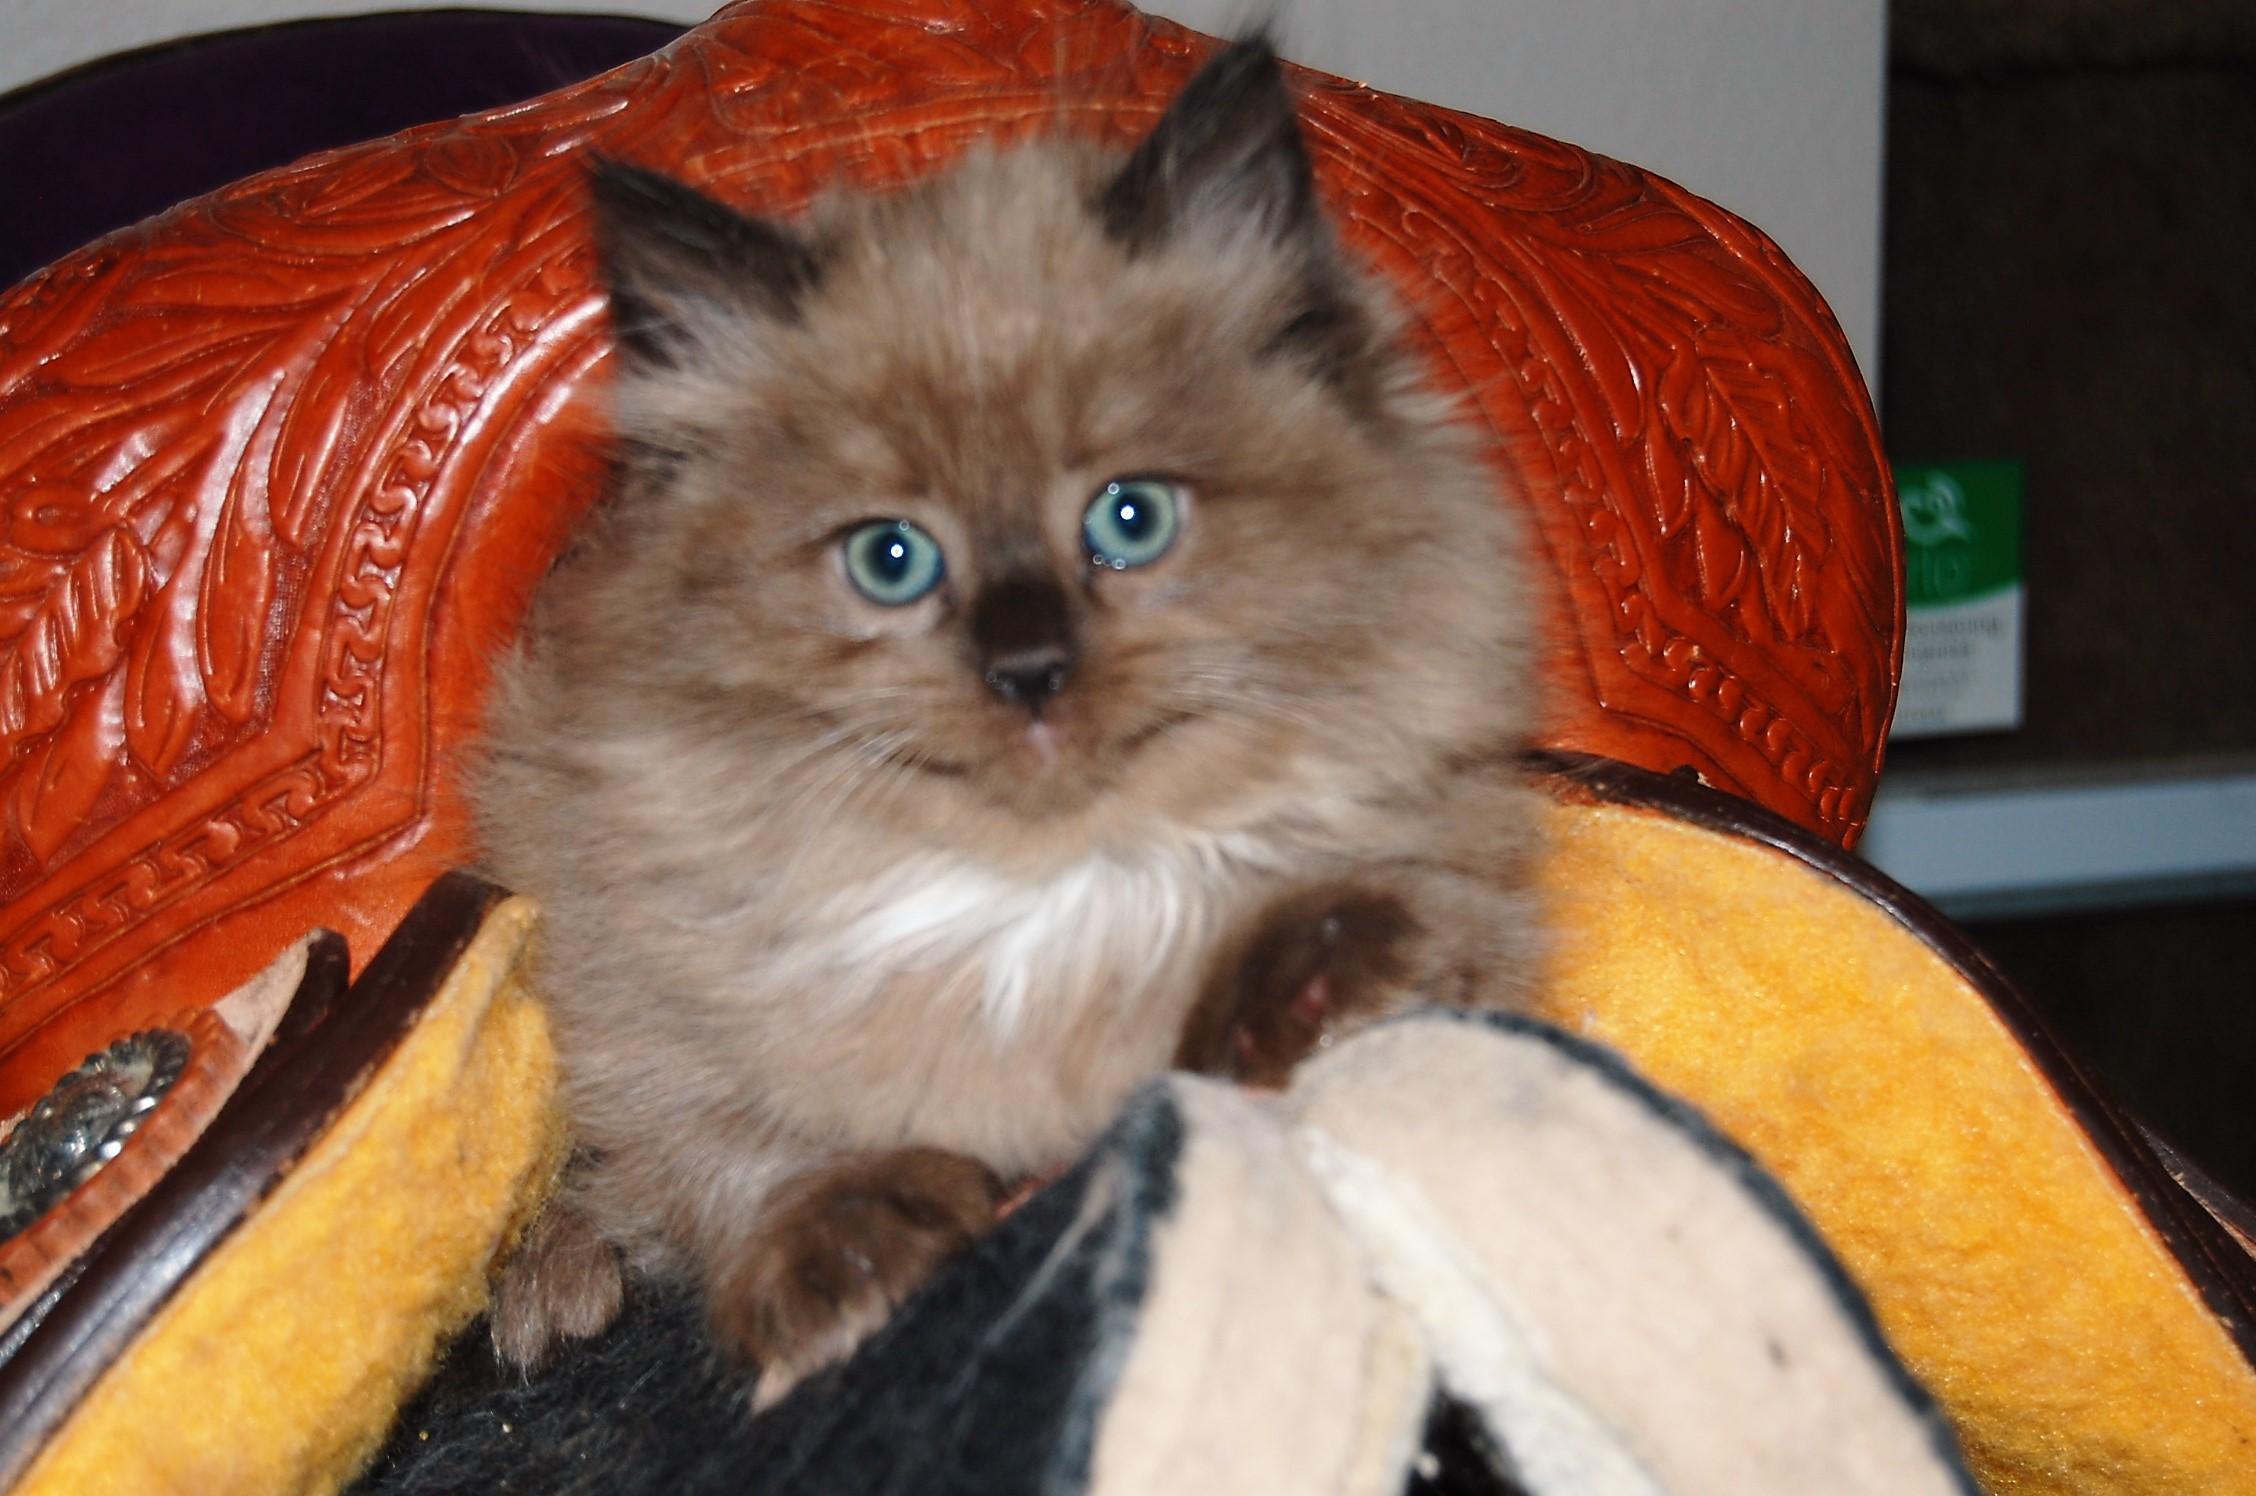 Ragdoll kittens for sale in Dallas Metroplex area